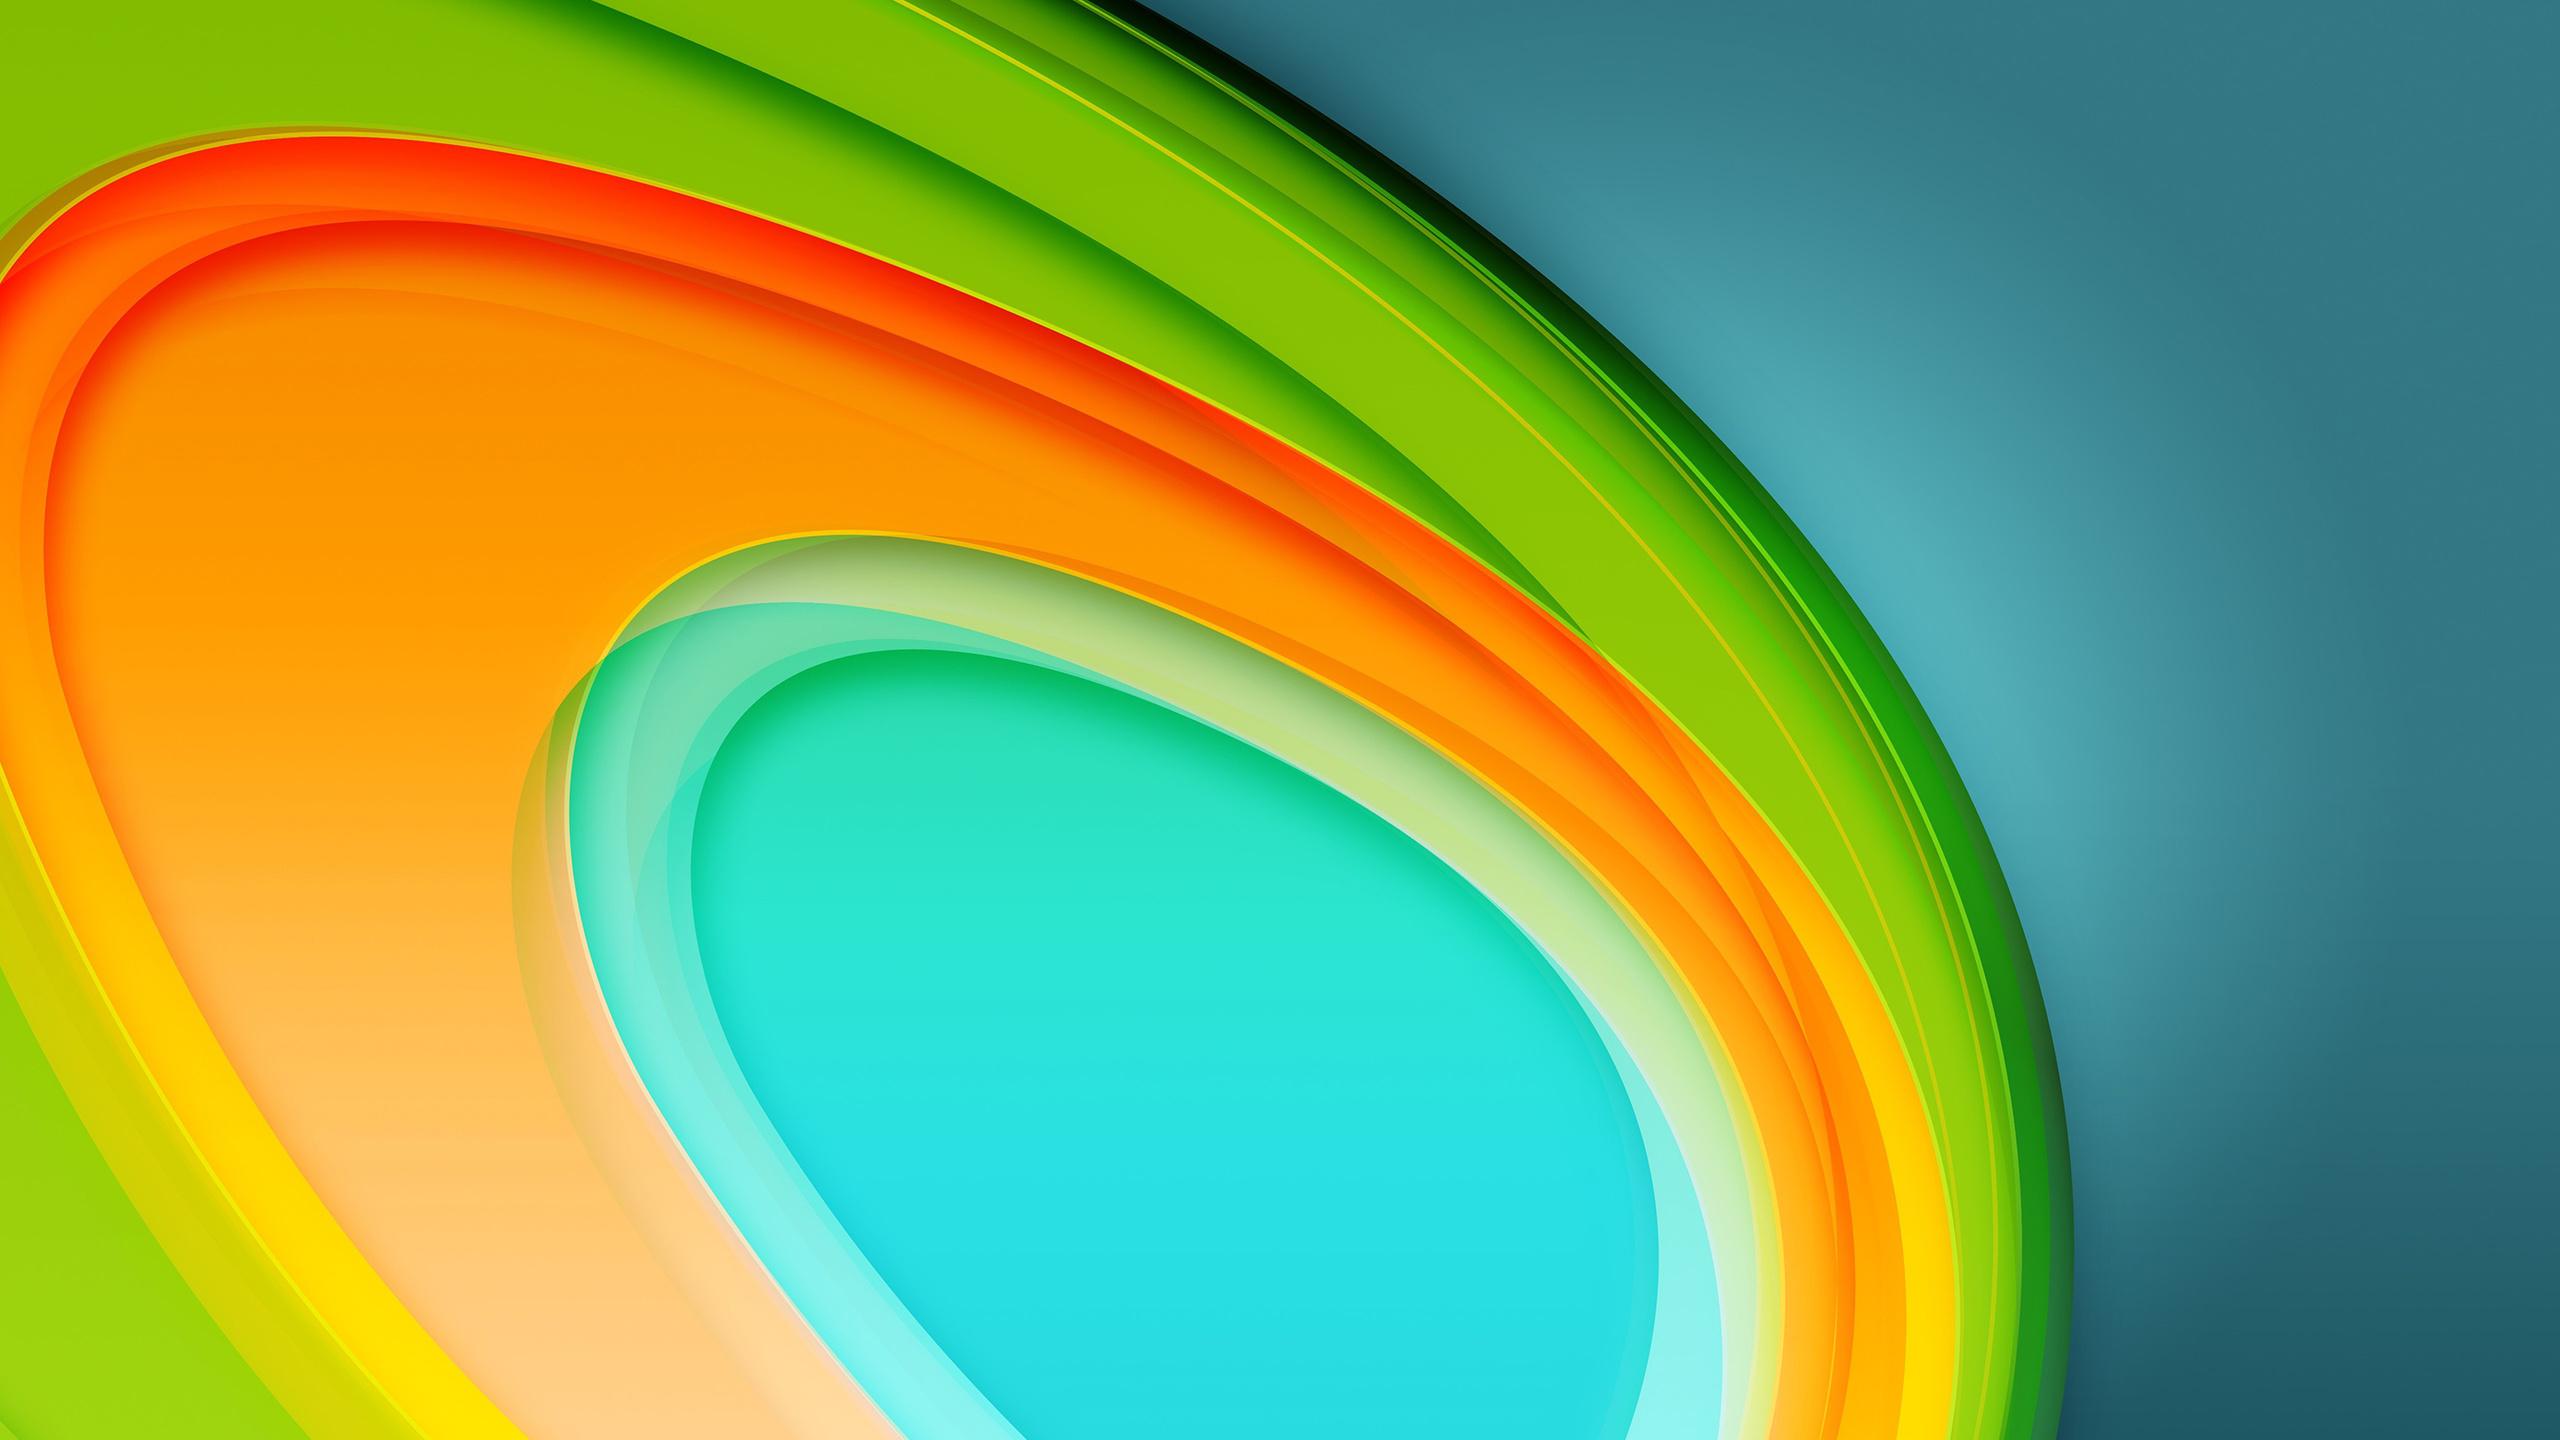 Colorful Circles 4K 5K (2560x1440)